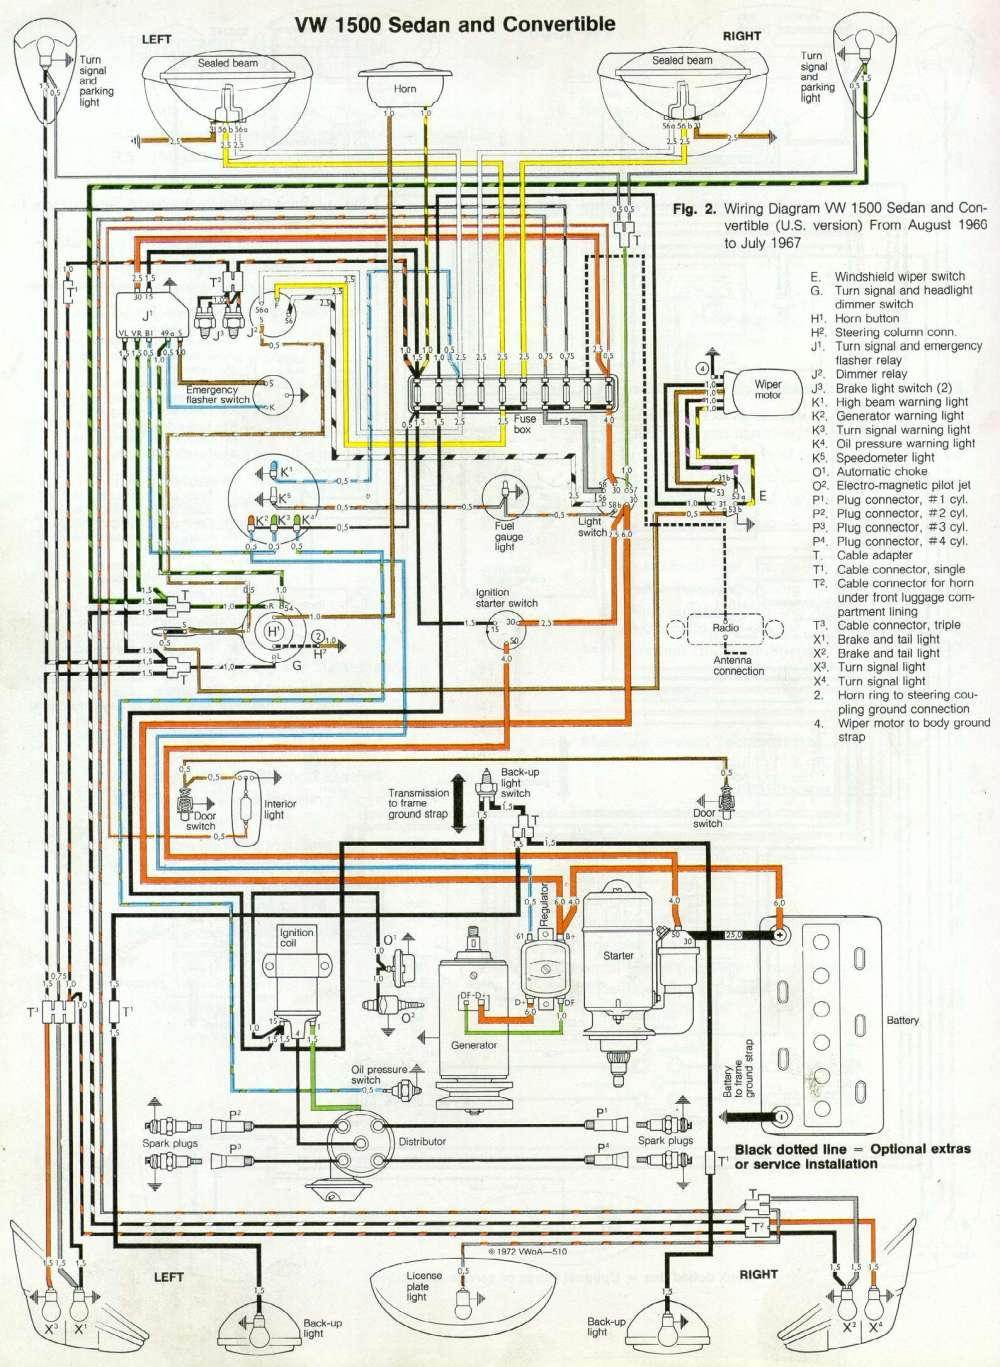 medium resolution of 1967 vw 1500 sedan convertible wiring diagram drawing a